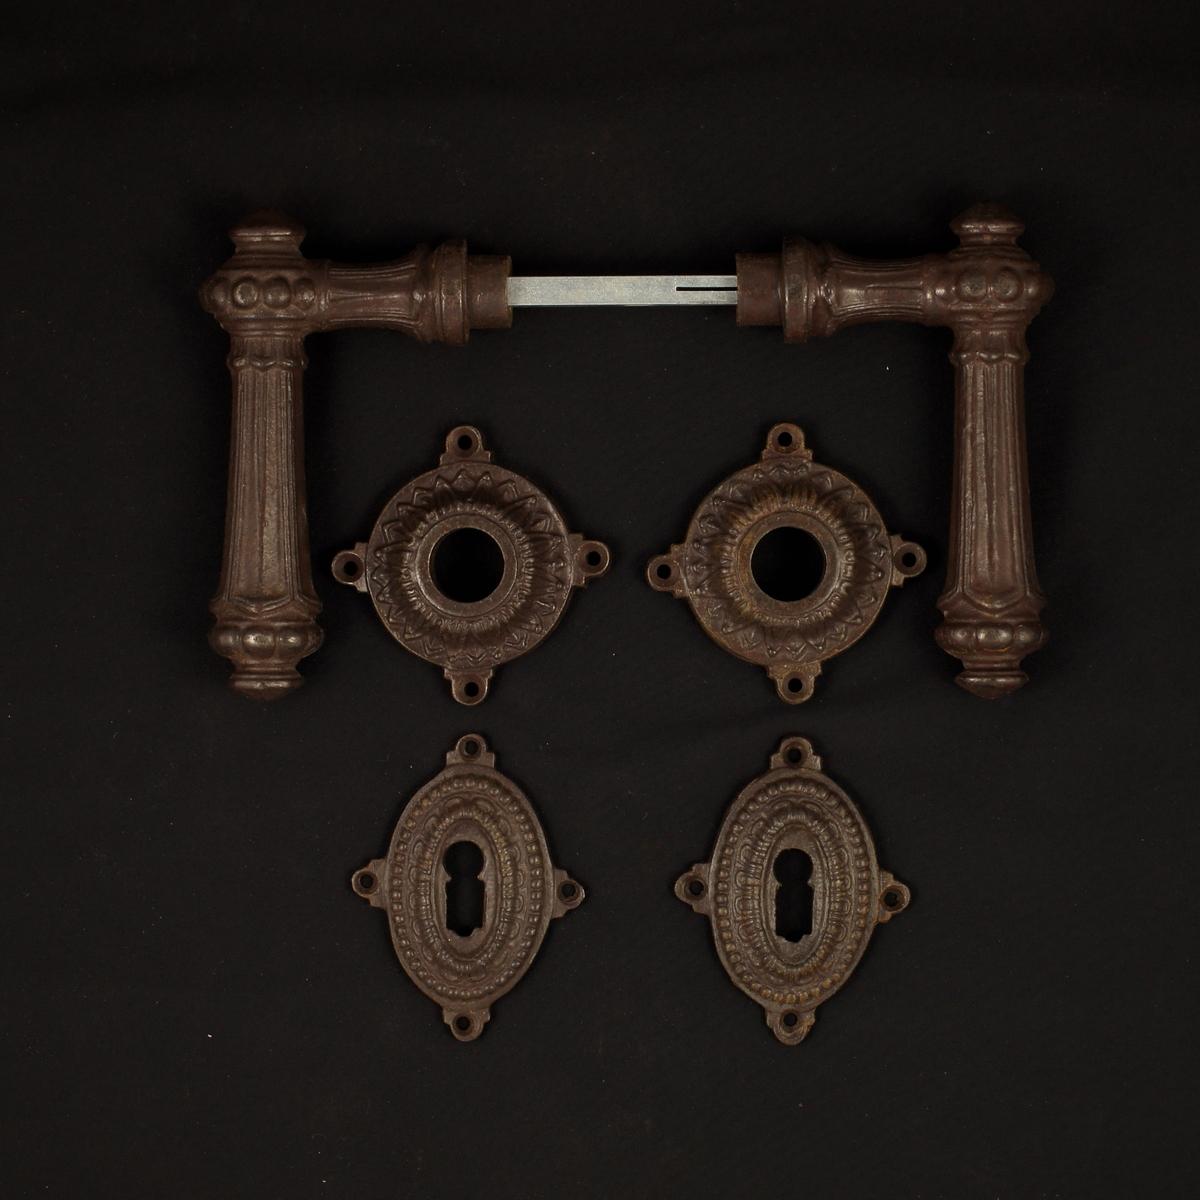 Haustür Rosettengarnitur - antike Türdrücker, Türklinken, Türbeschläge